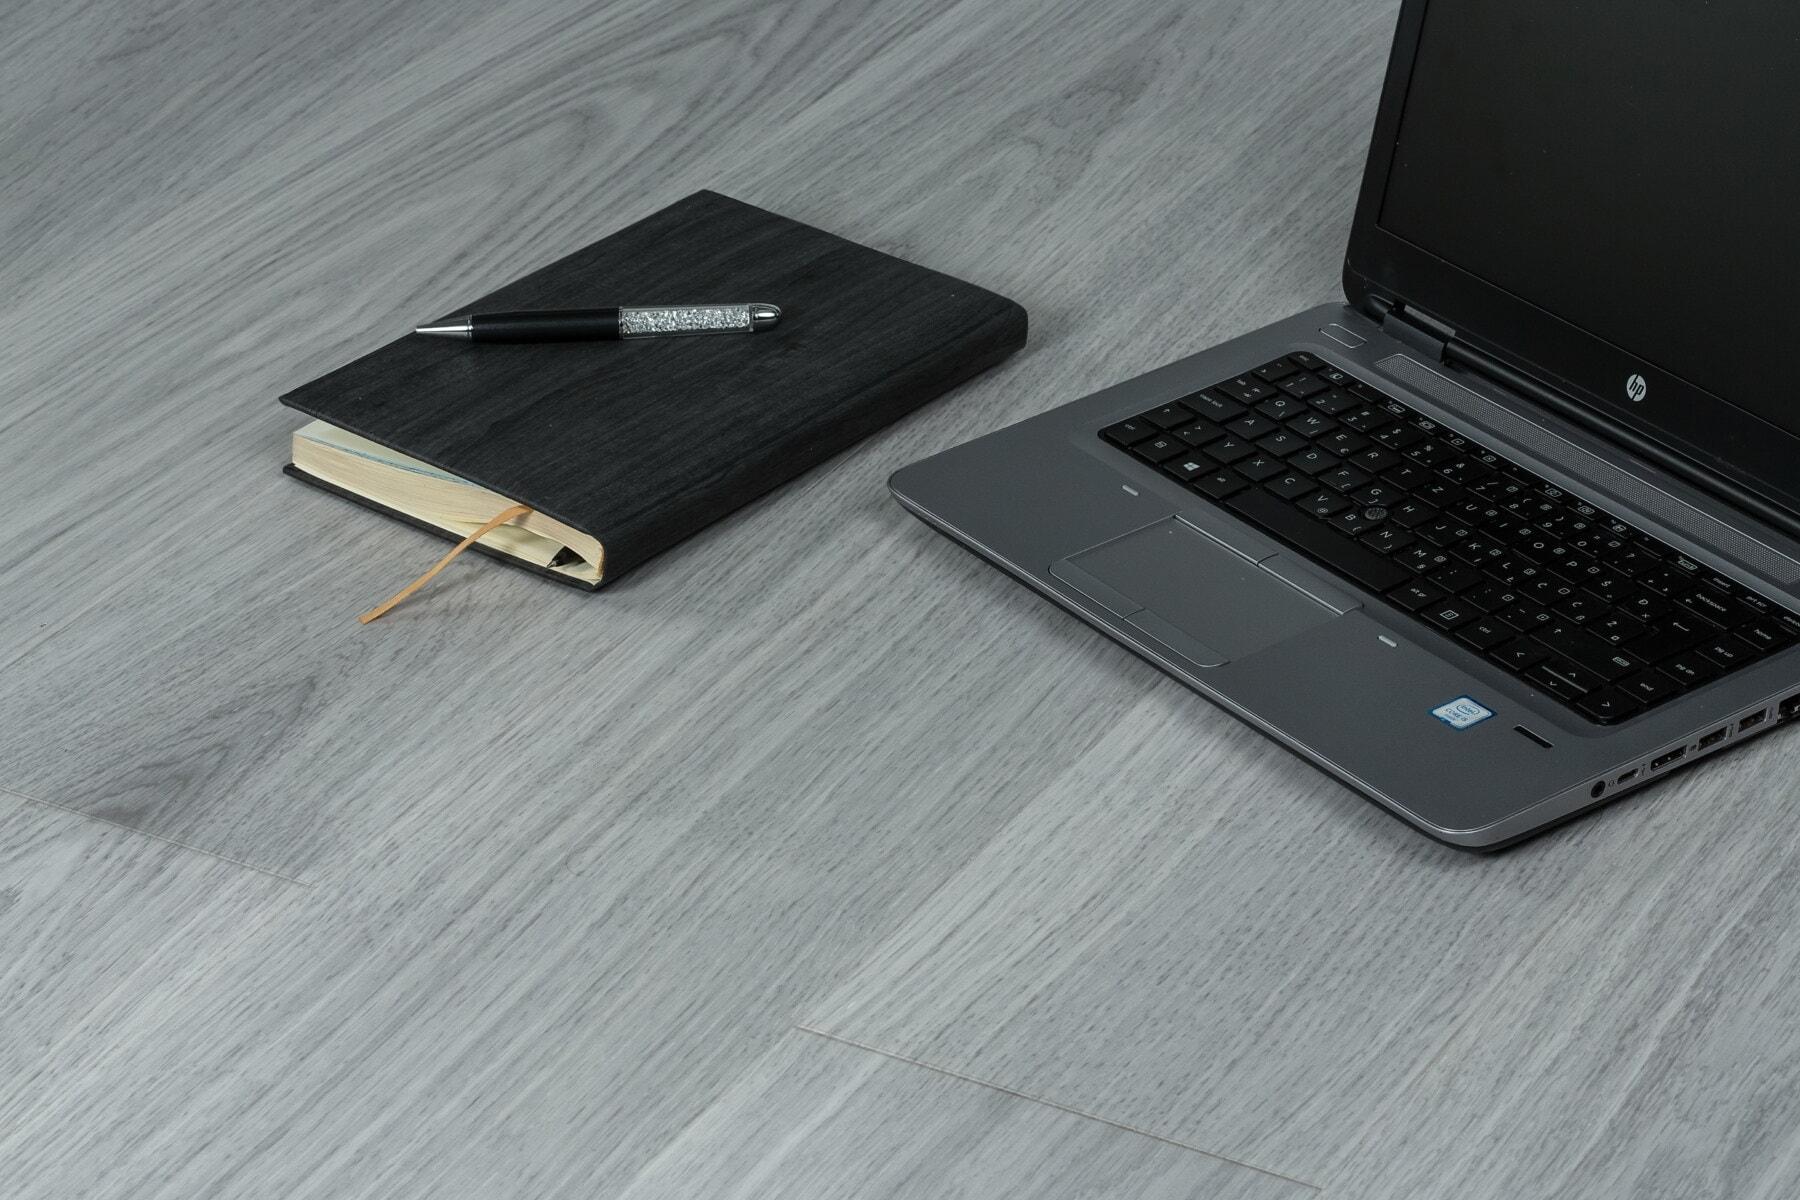 negru, calculator portabil, Minimalismul, birou, creion, gri, notebook-uri, calculator numeric, calculator portabil, calculator personal